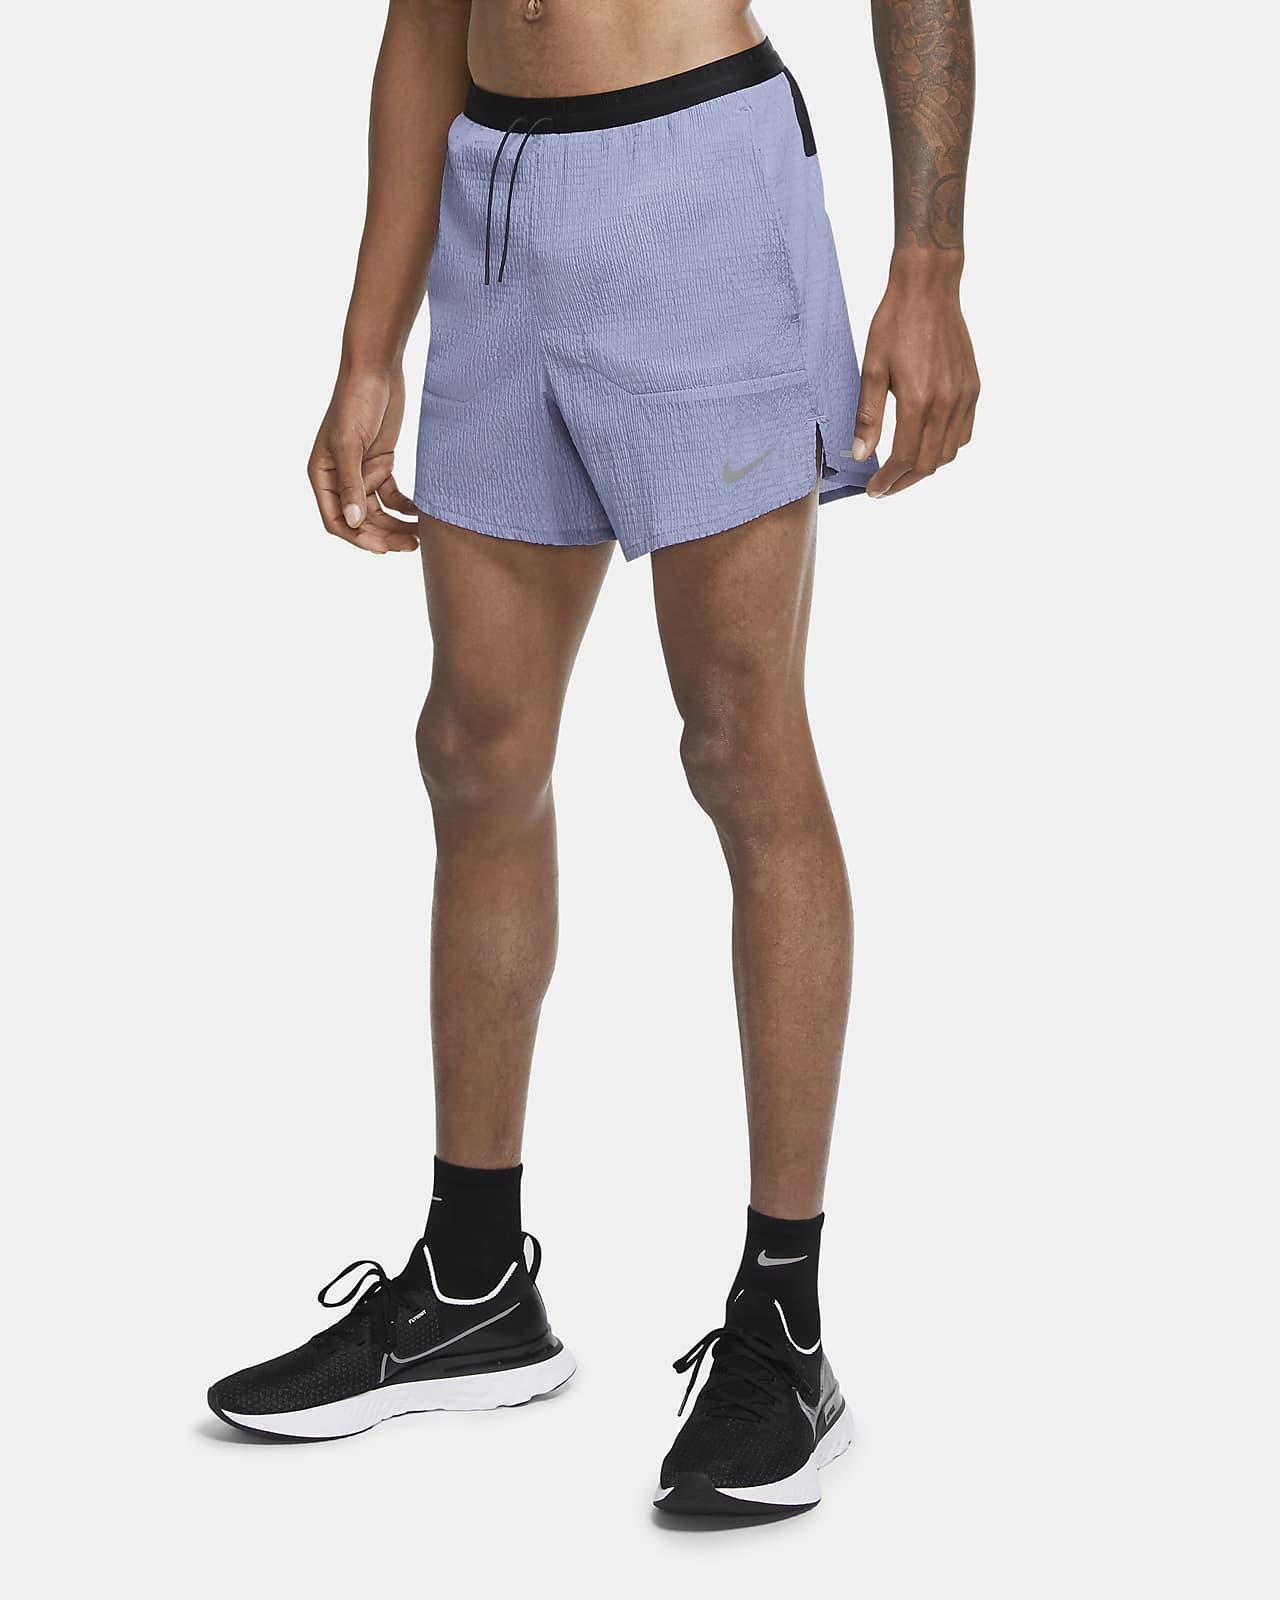 Short de running Nike Flex Stride Run Division pour Homme